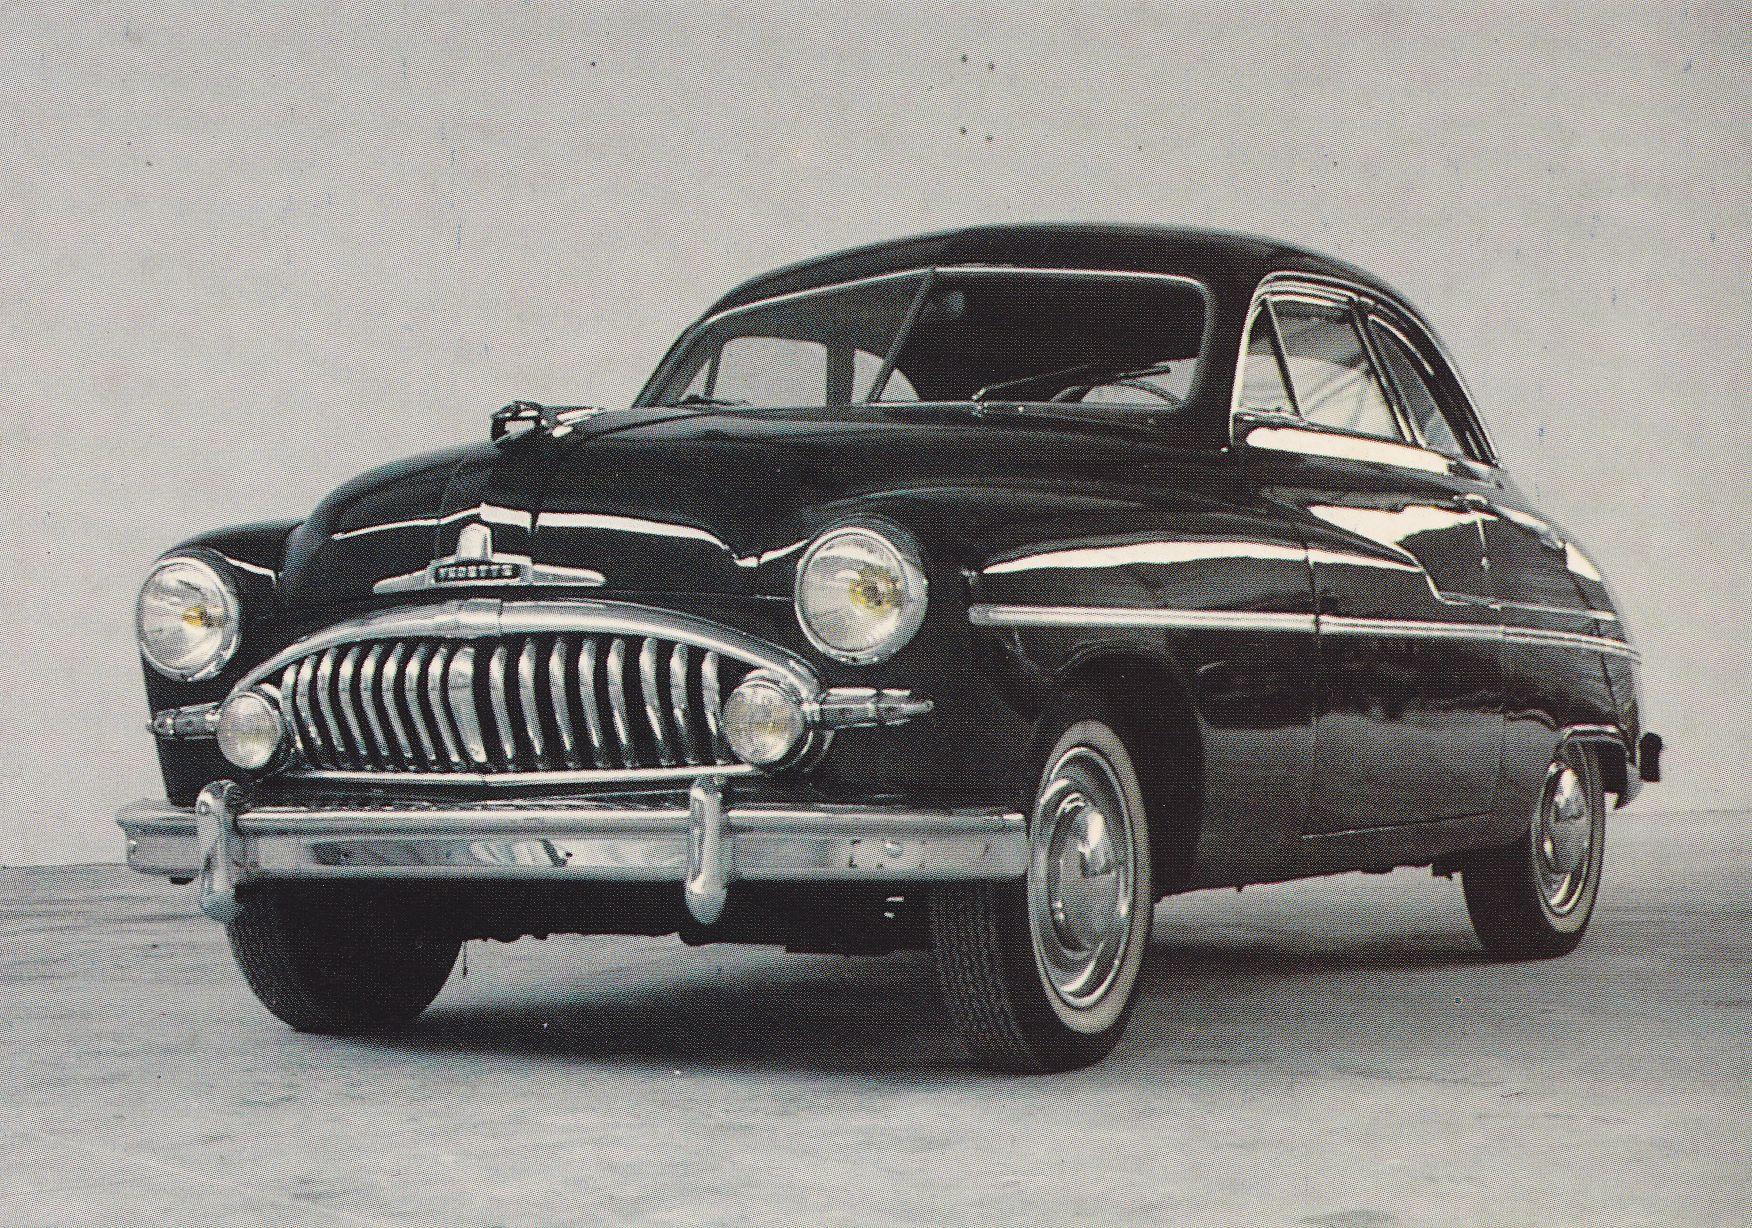 ford vedette 1950 france 0014 voiture de tourisme ford saf france autoalmanach partage. Black Bedroom Furniture Sets. Home Design Ideas